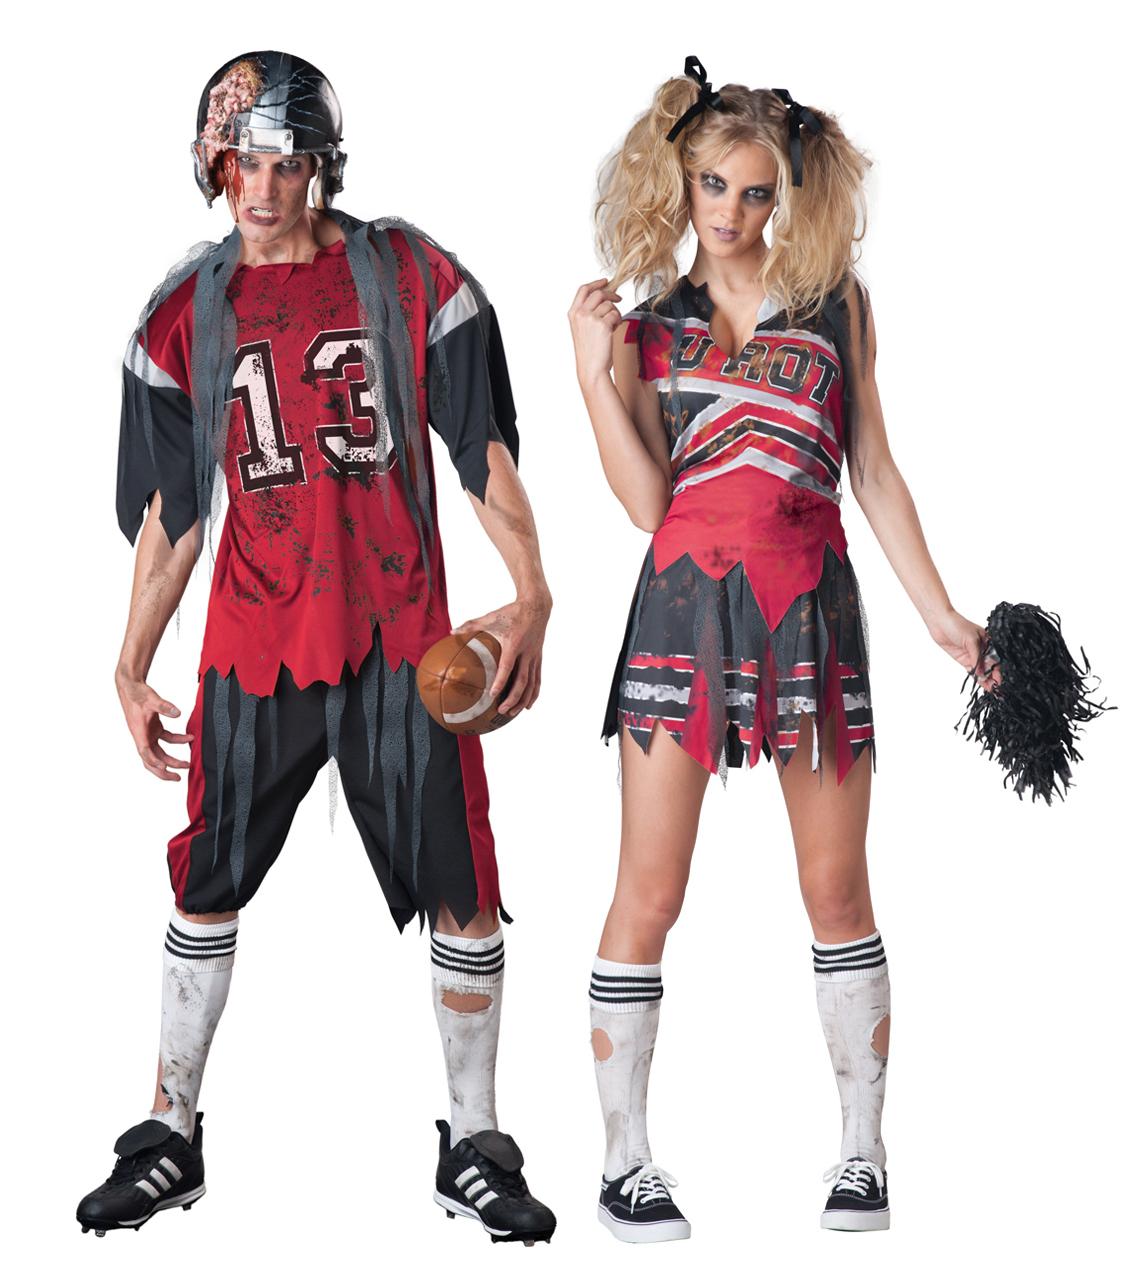 Zombie American Footballer or Cheerleader Halloween Fancy Dress  Adults Costumes